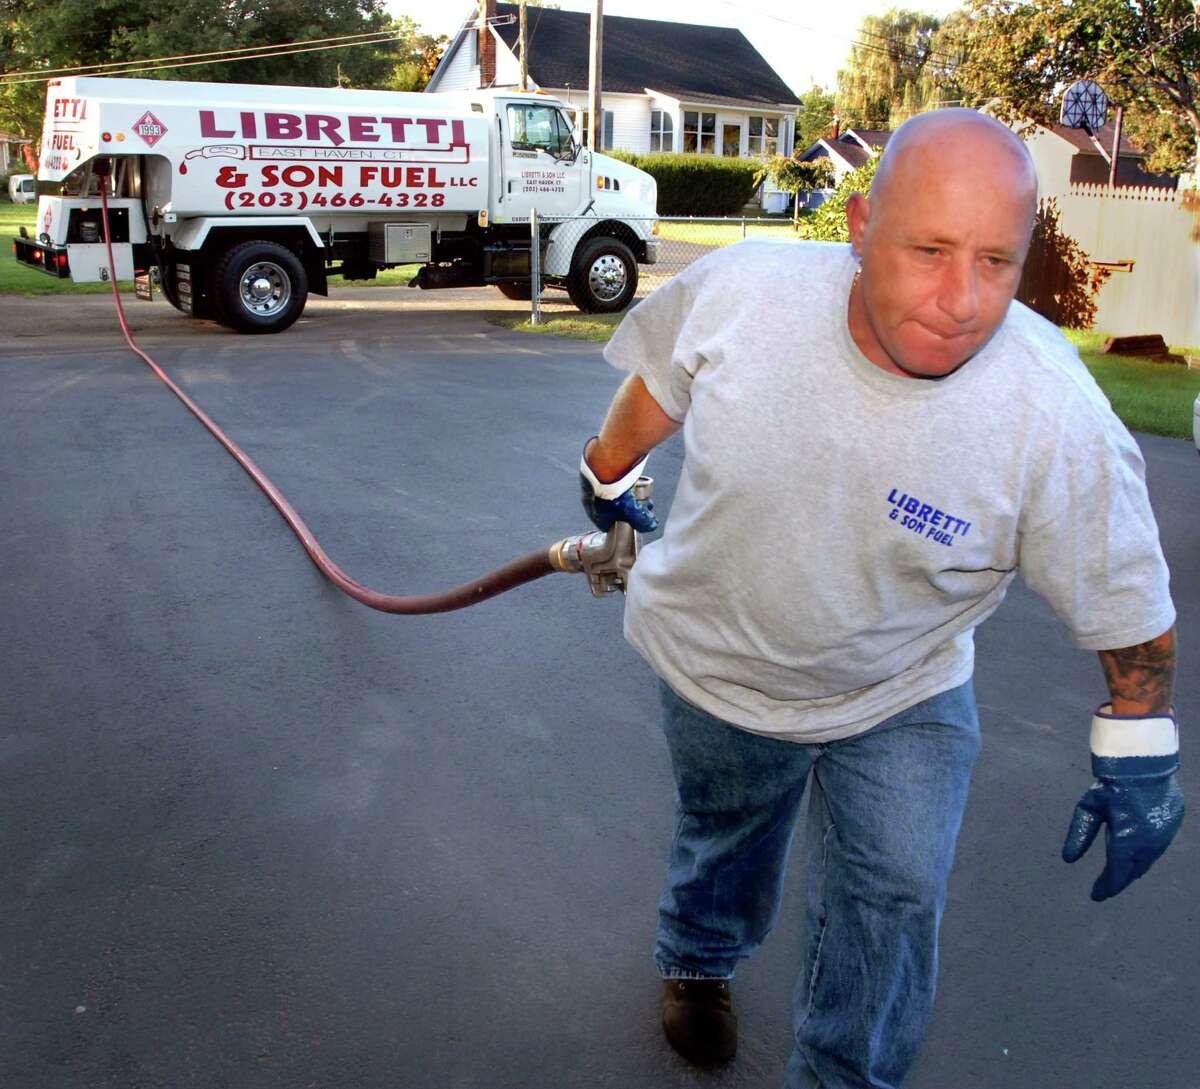 (ms093009)-Nick Libretti, owner of Libretti & Son Fuel delivers oil in East Haven. Melanie Stengel/Register